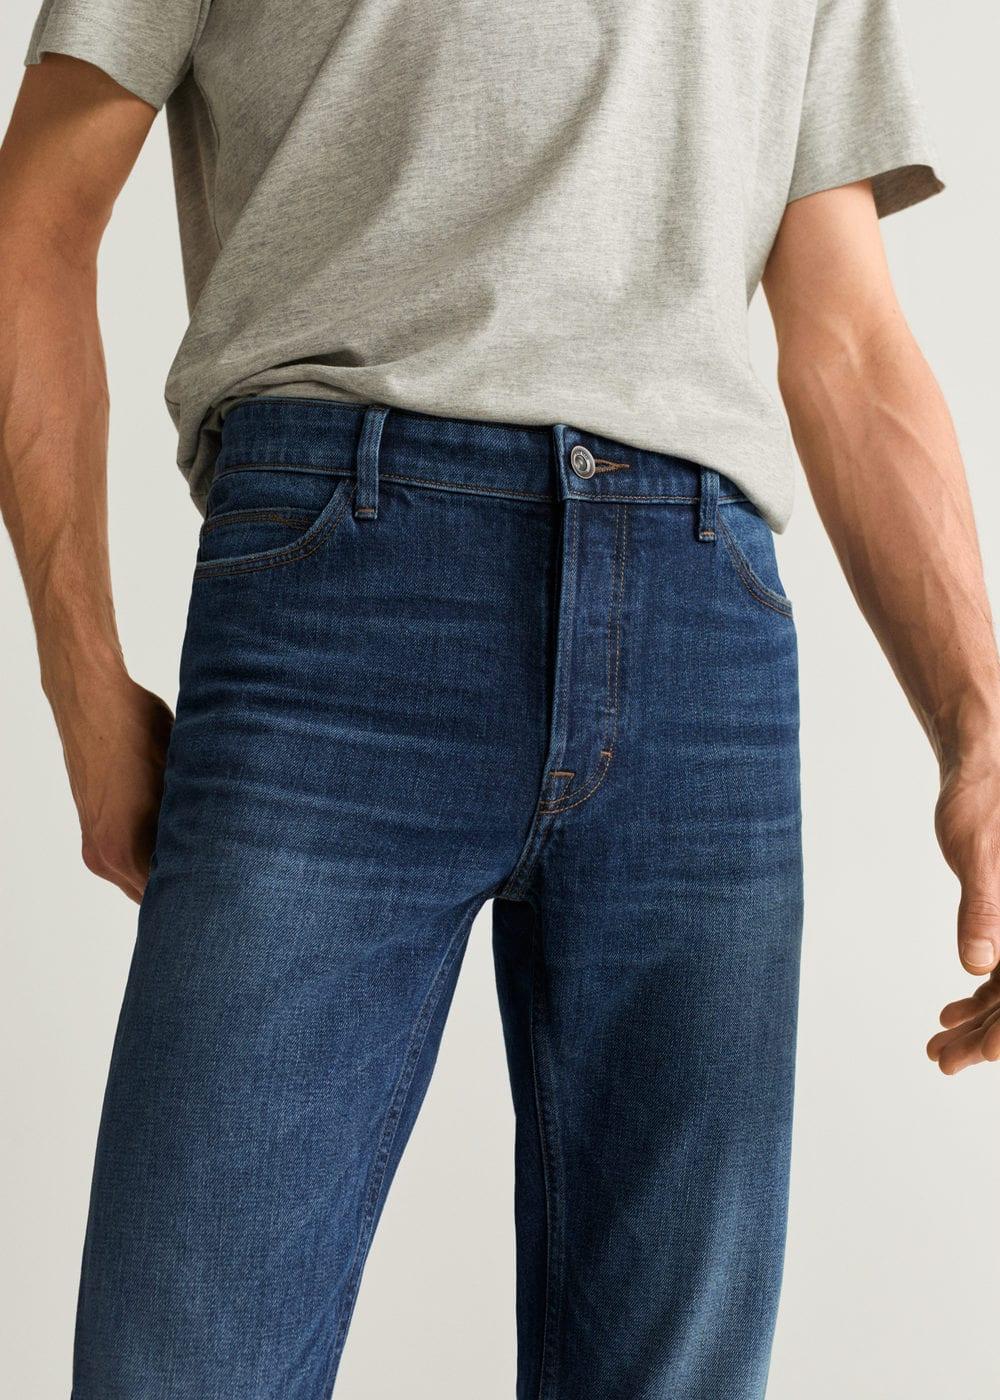 h-tim5:jeans tim slim fit lavado oscuro desgastado